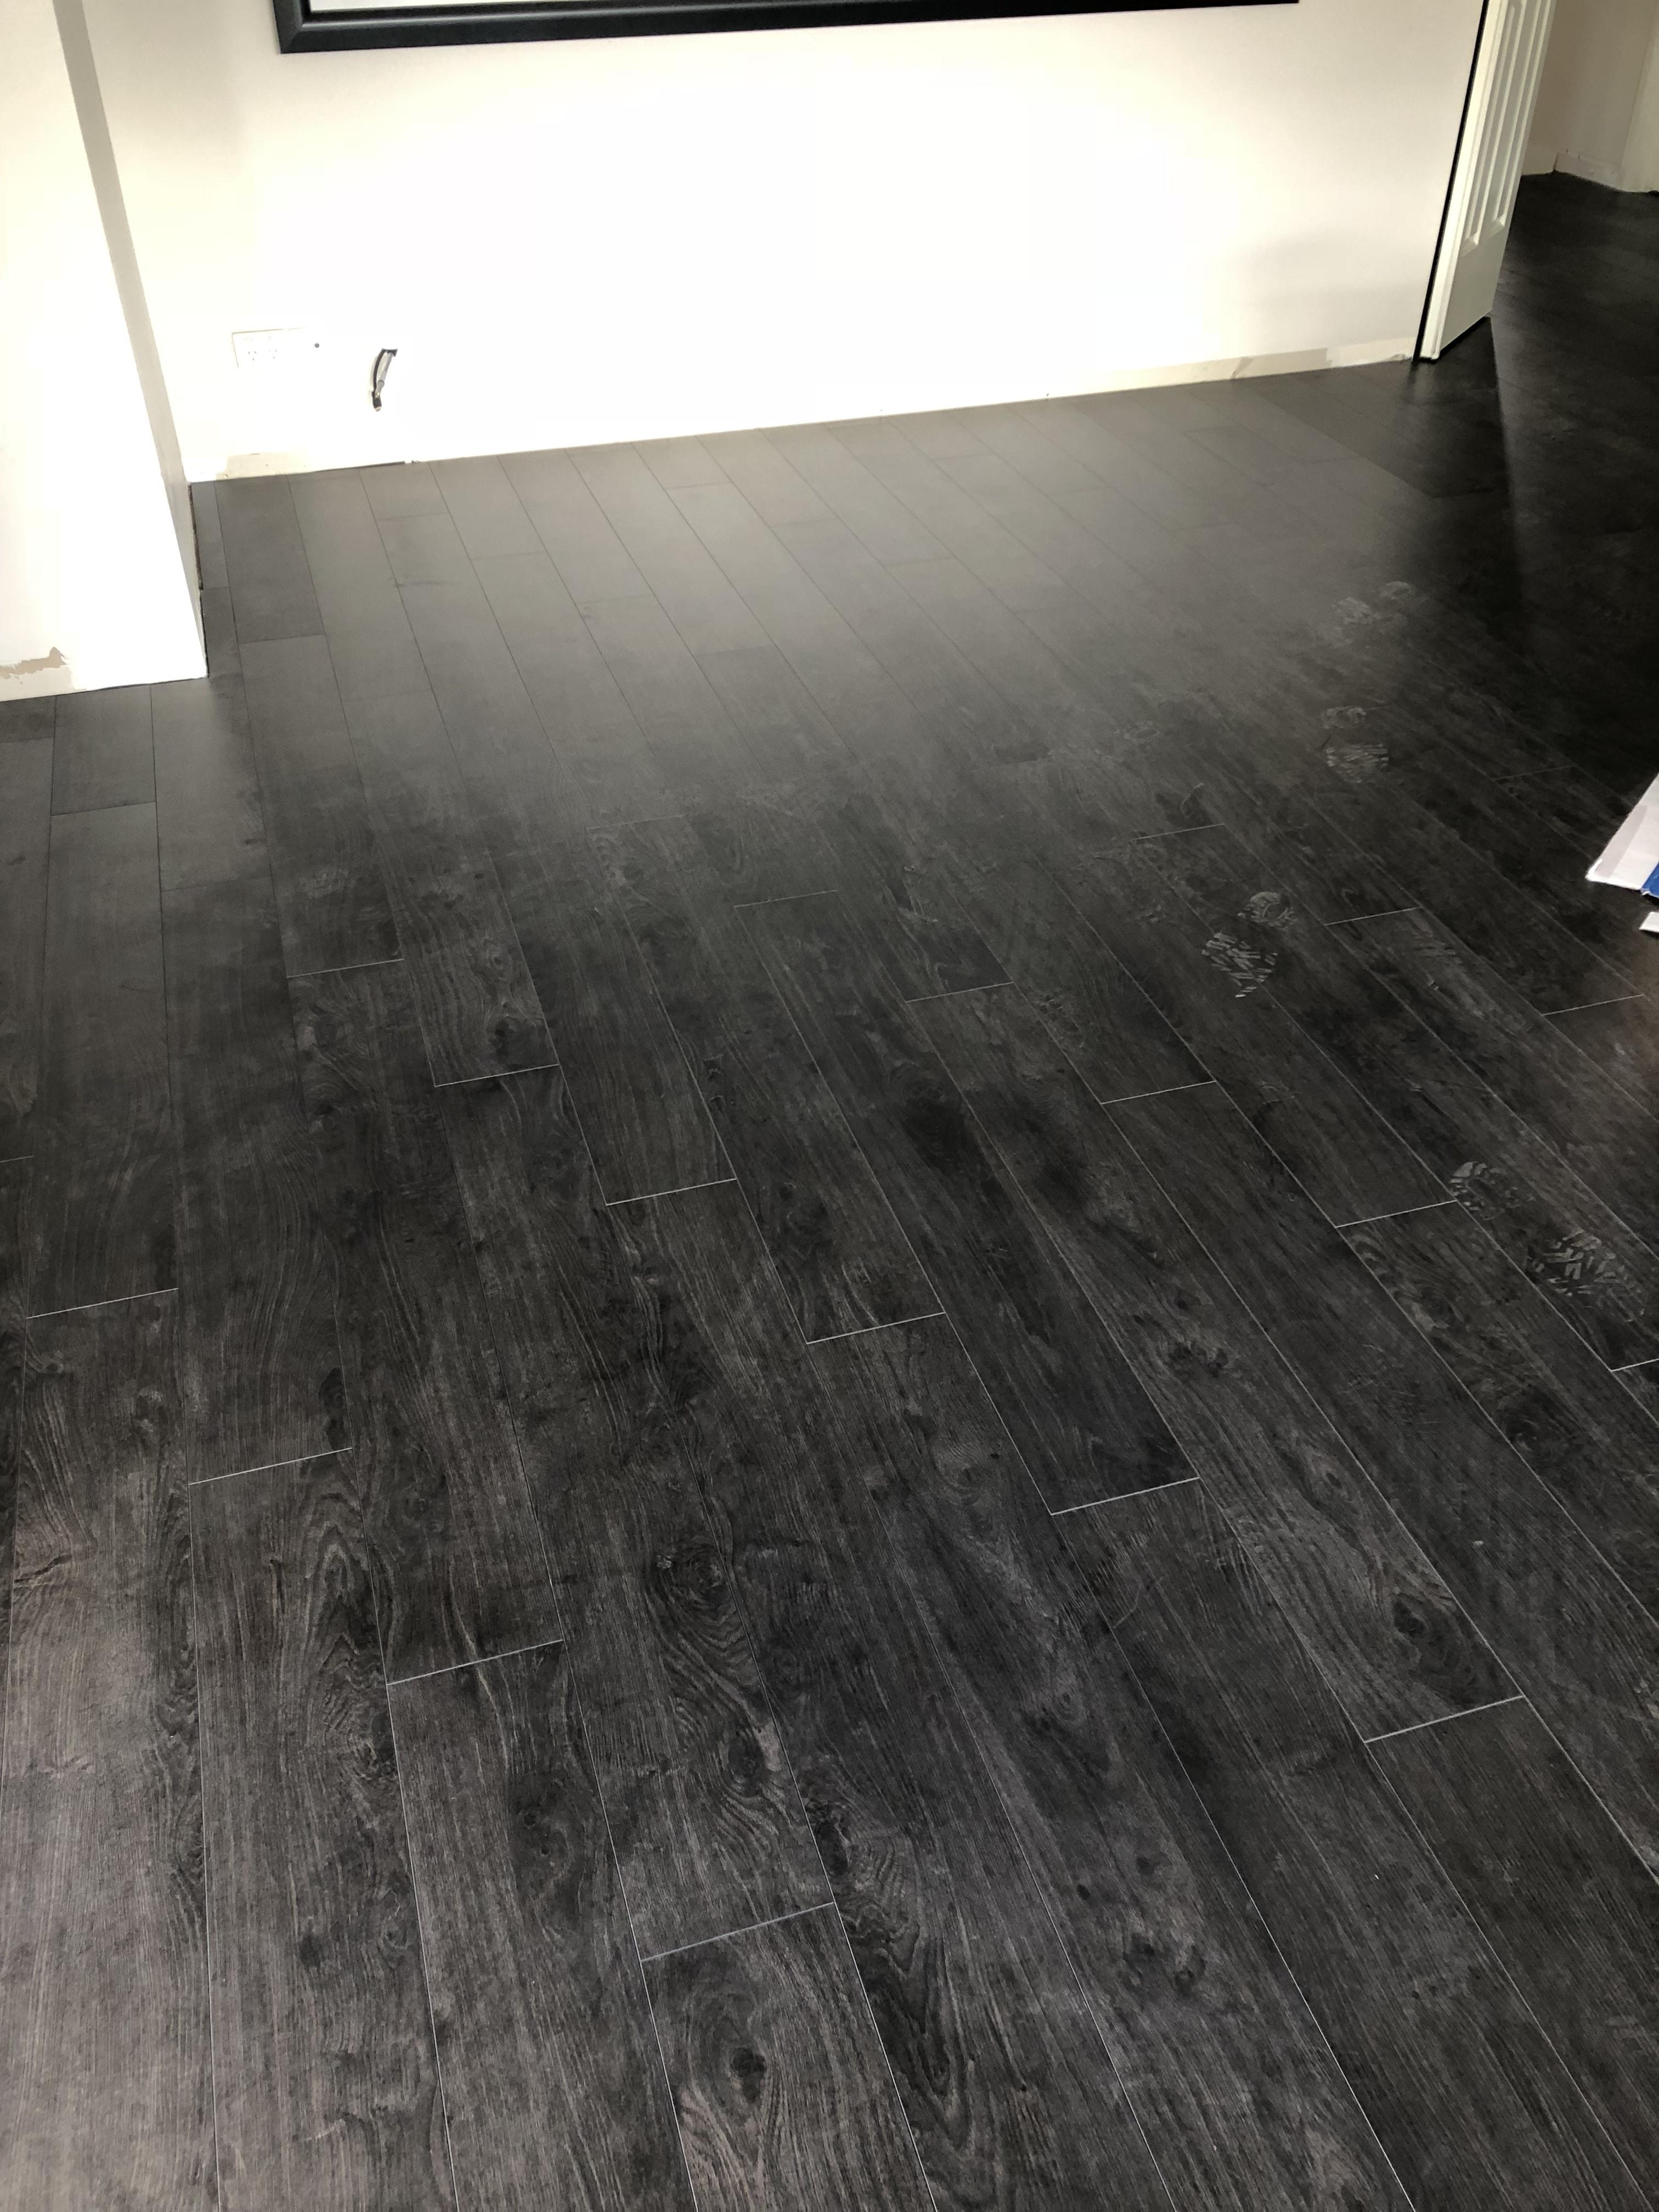 Black Laminate Flooring 1215x195x12mm